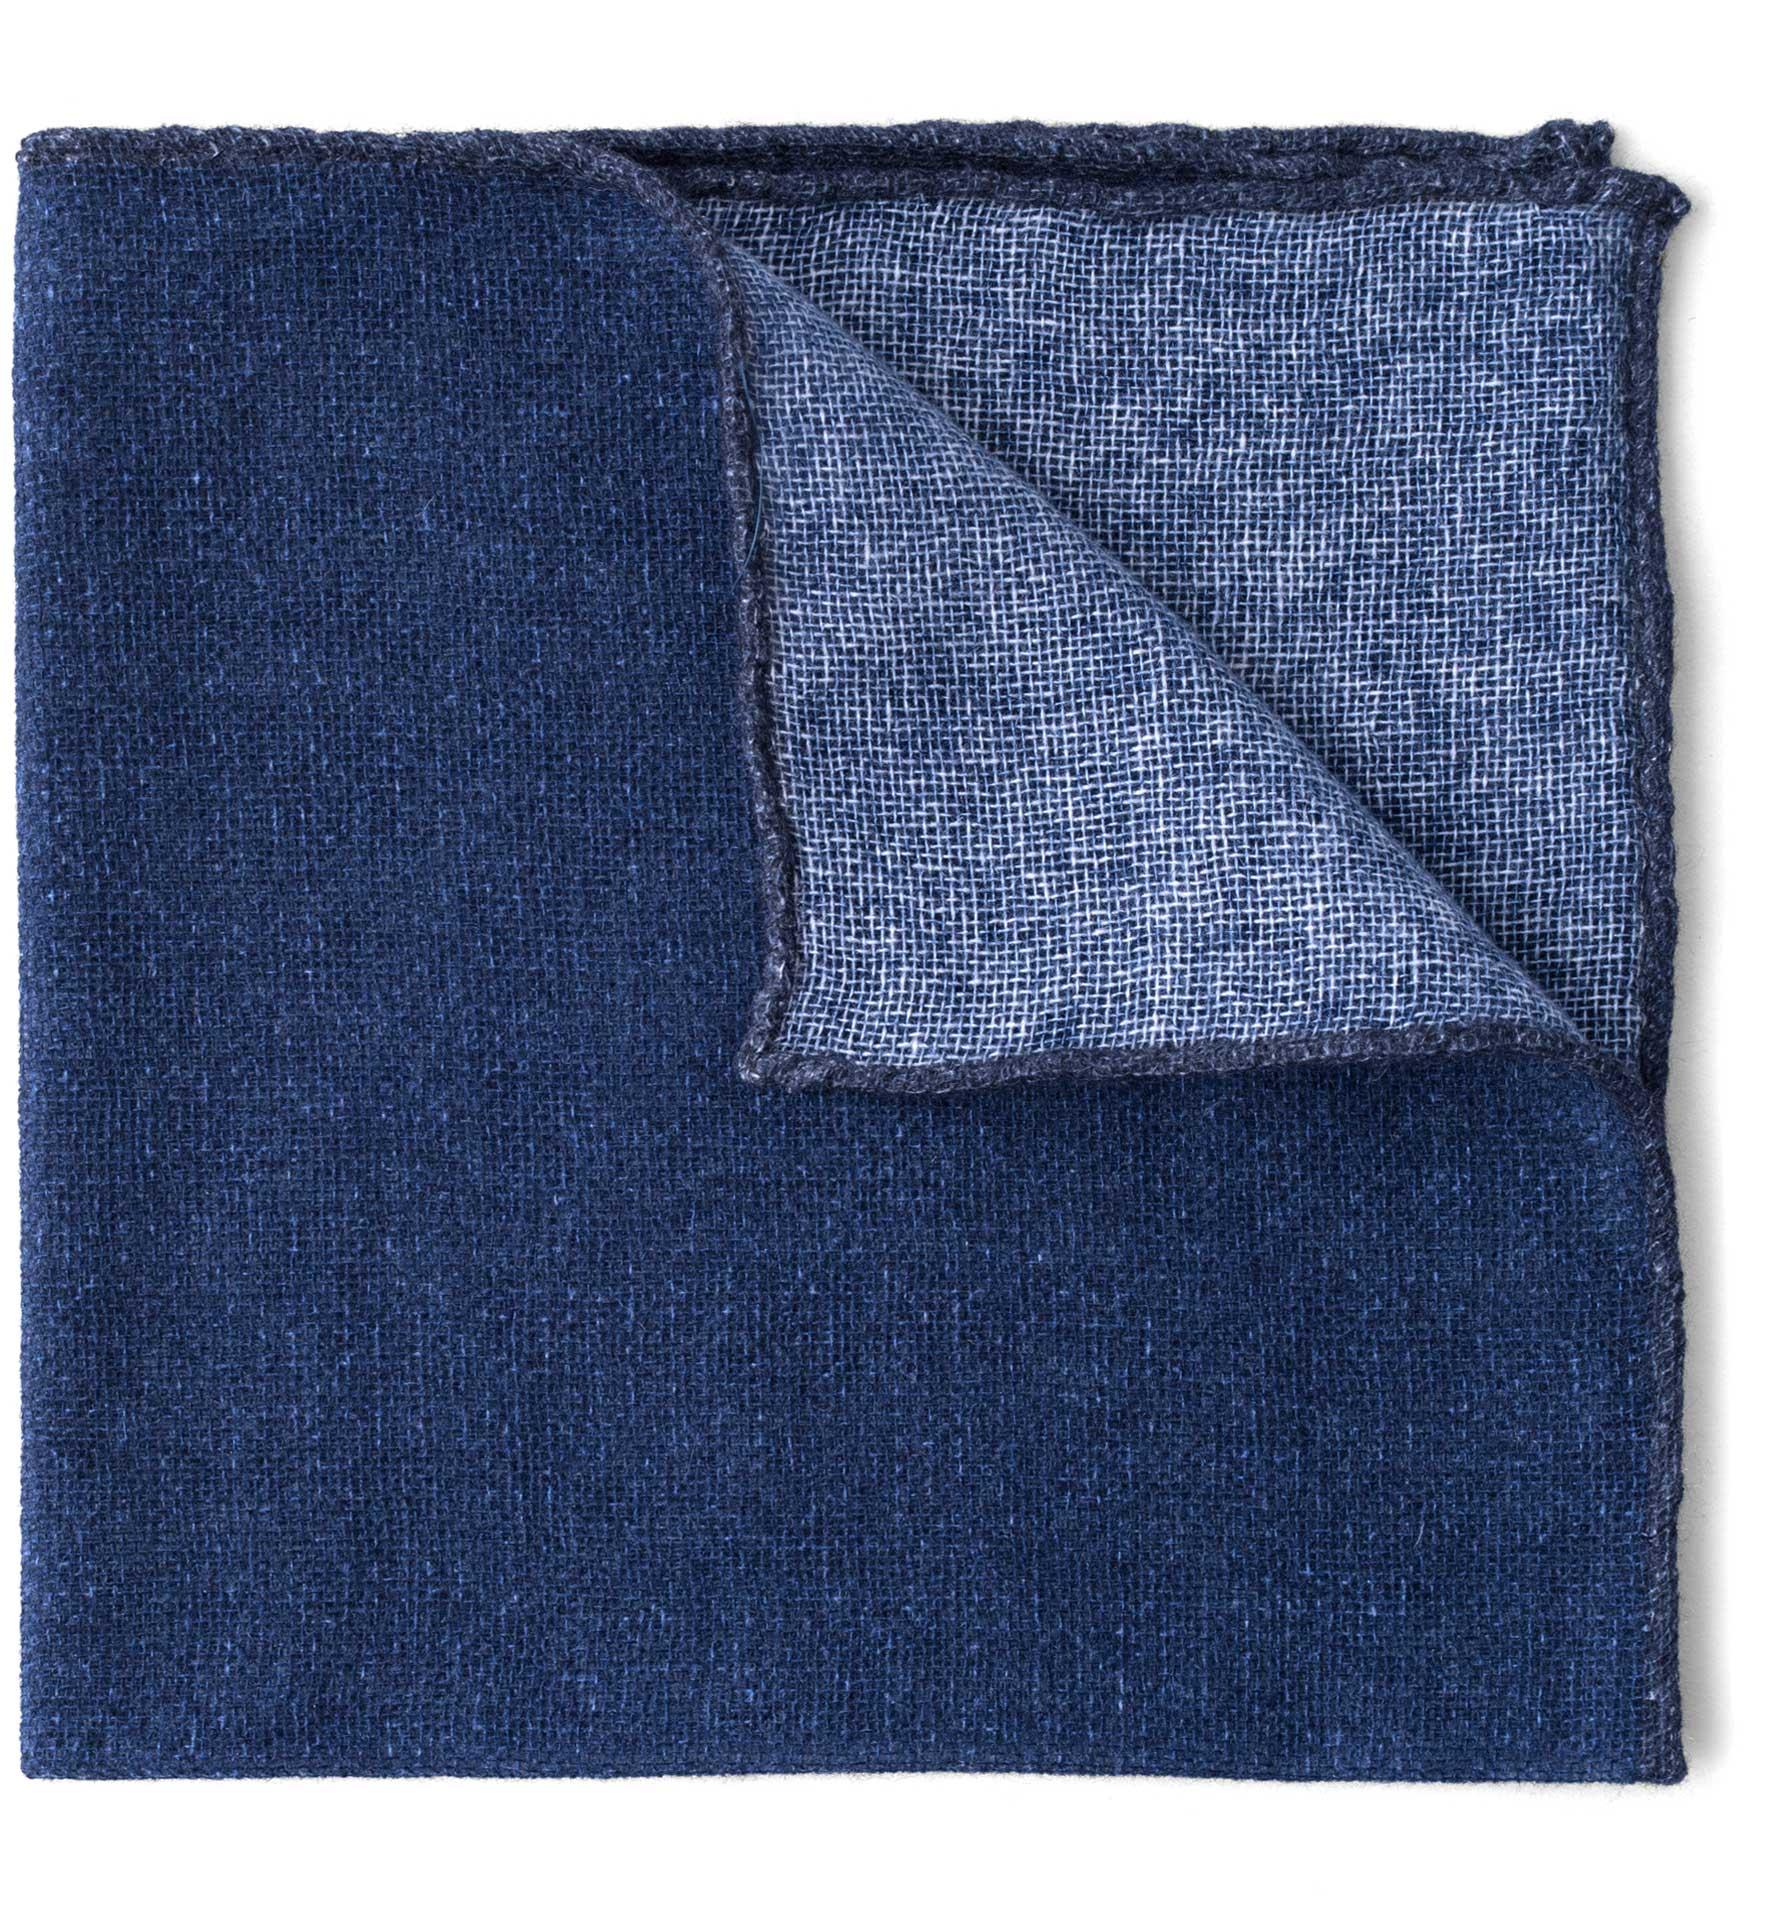 Zoom Image of Navy Tipped Indigo Cashmere Pocket Square